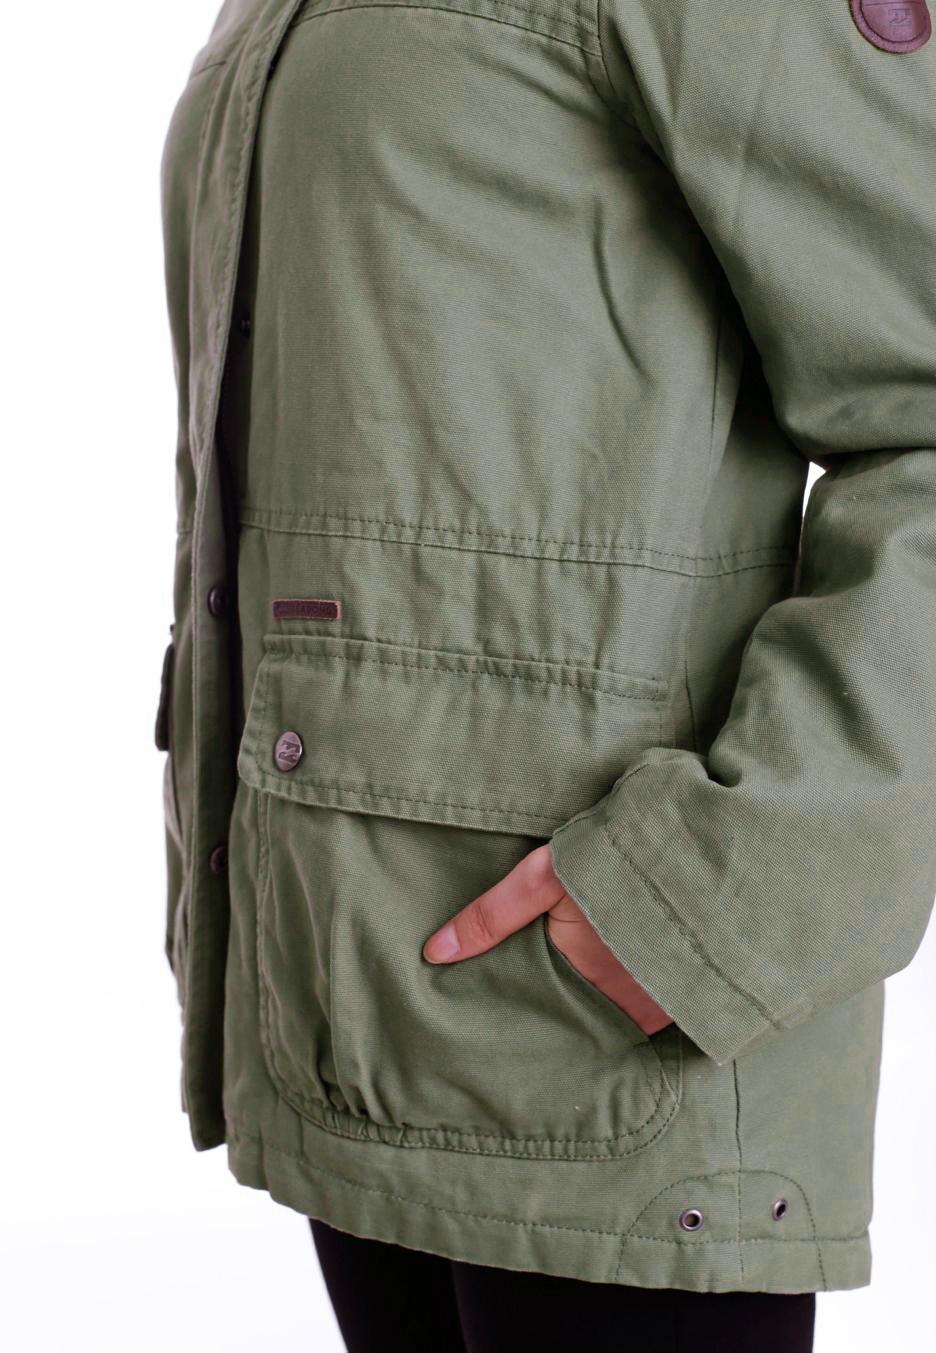 Jual Jaket Hoodie Paramore Black Termurah 2018 Imo Turbo 2gb Ram 32 Rom 13mp5mp 15ghz Quad Core Billabong Iti Grunge Green Jacke Streetwear Shop Impericon Jacket